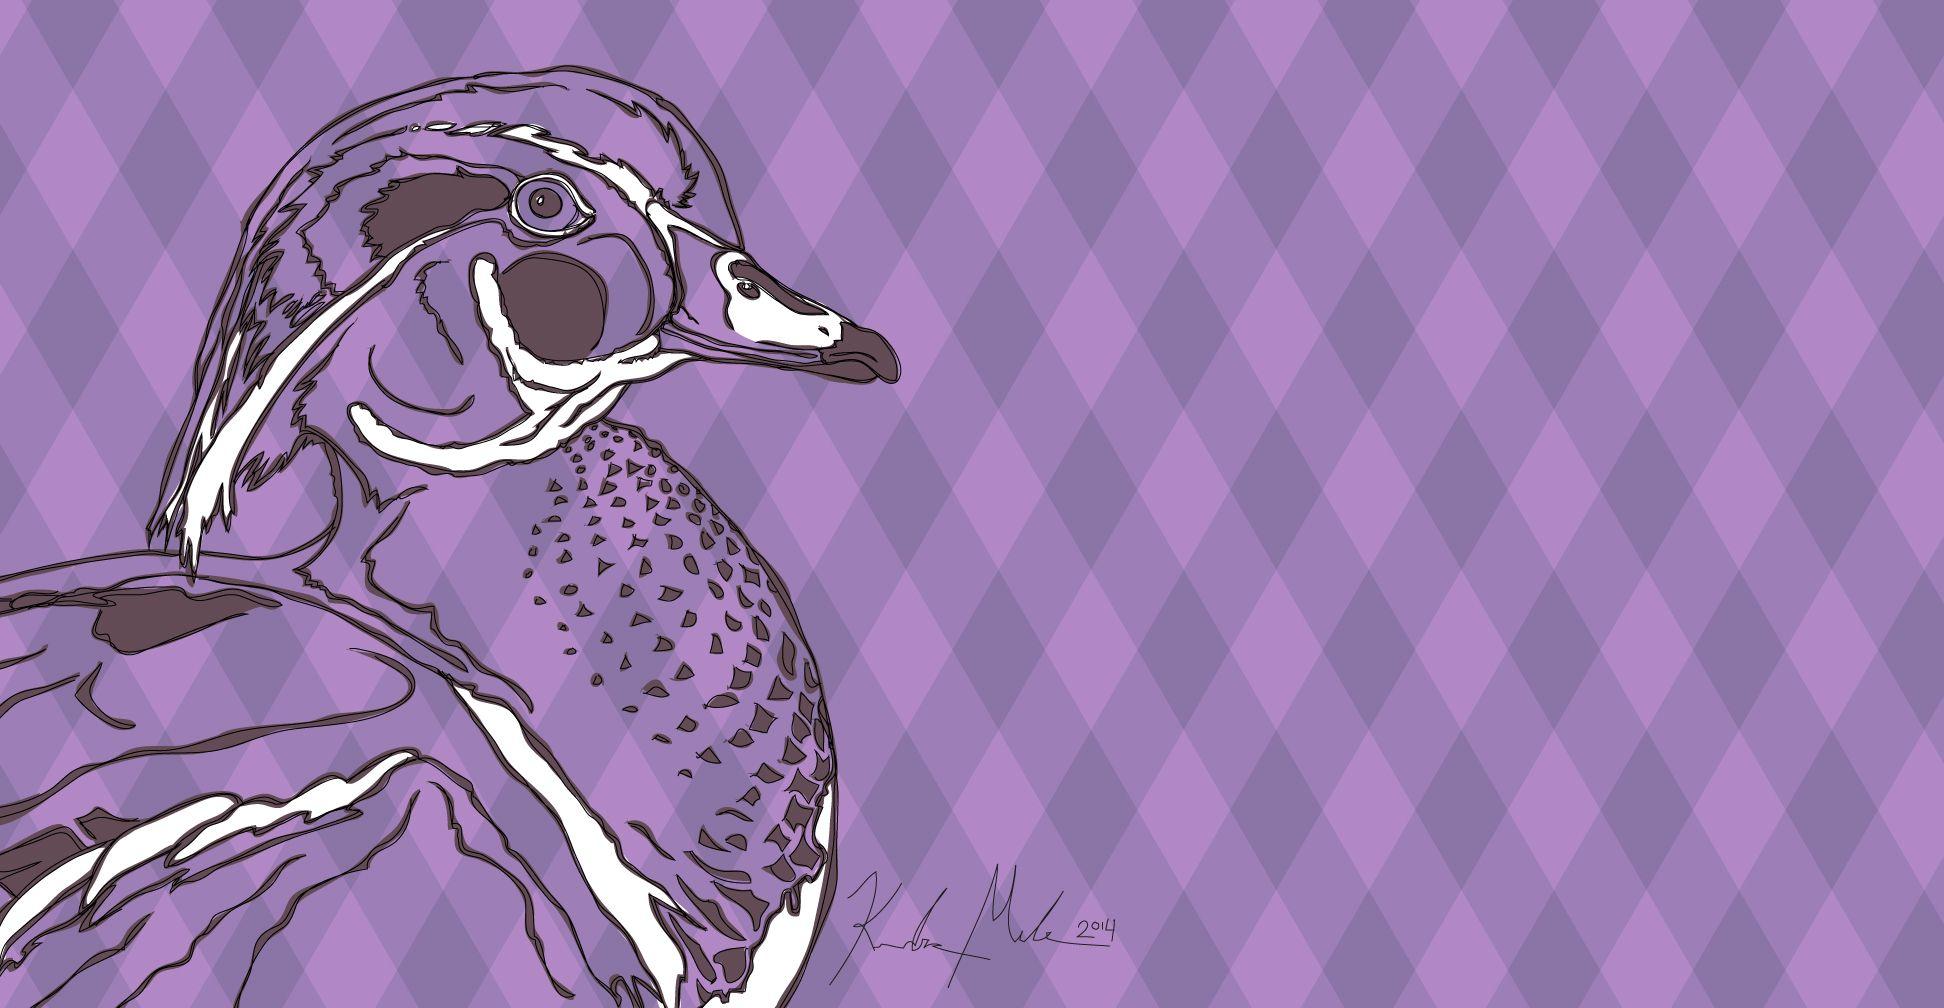 Duck - 2014 [digital drawing]   More Artwork on MederMade.wordpress.com - Portfolio: KendraMeder.wordpress.com